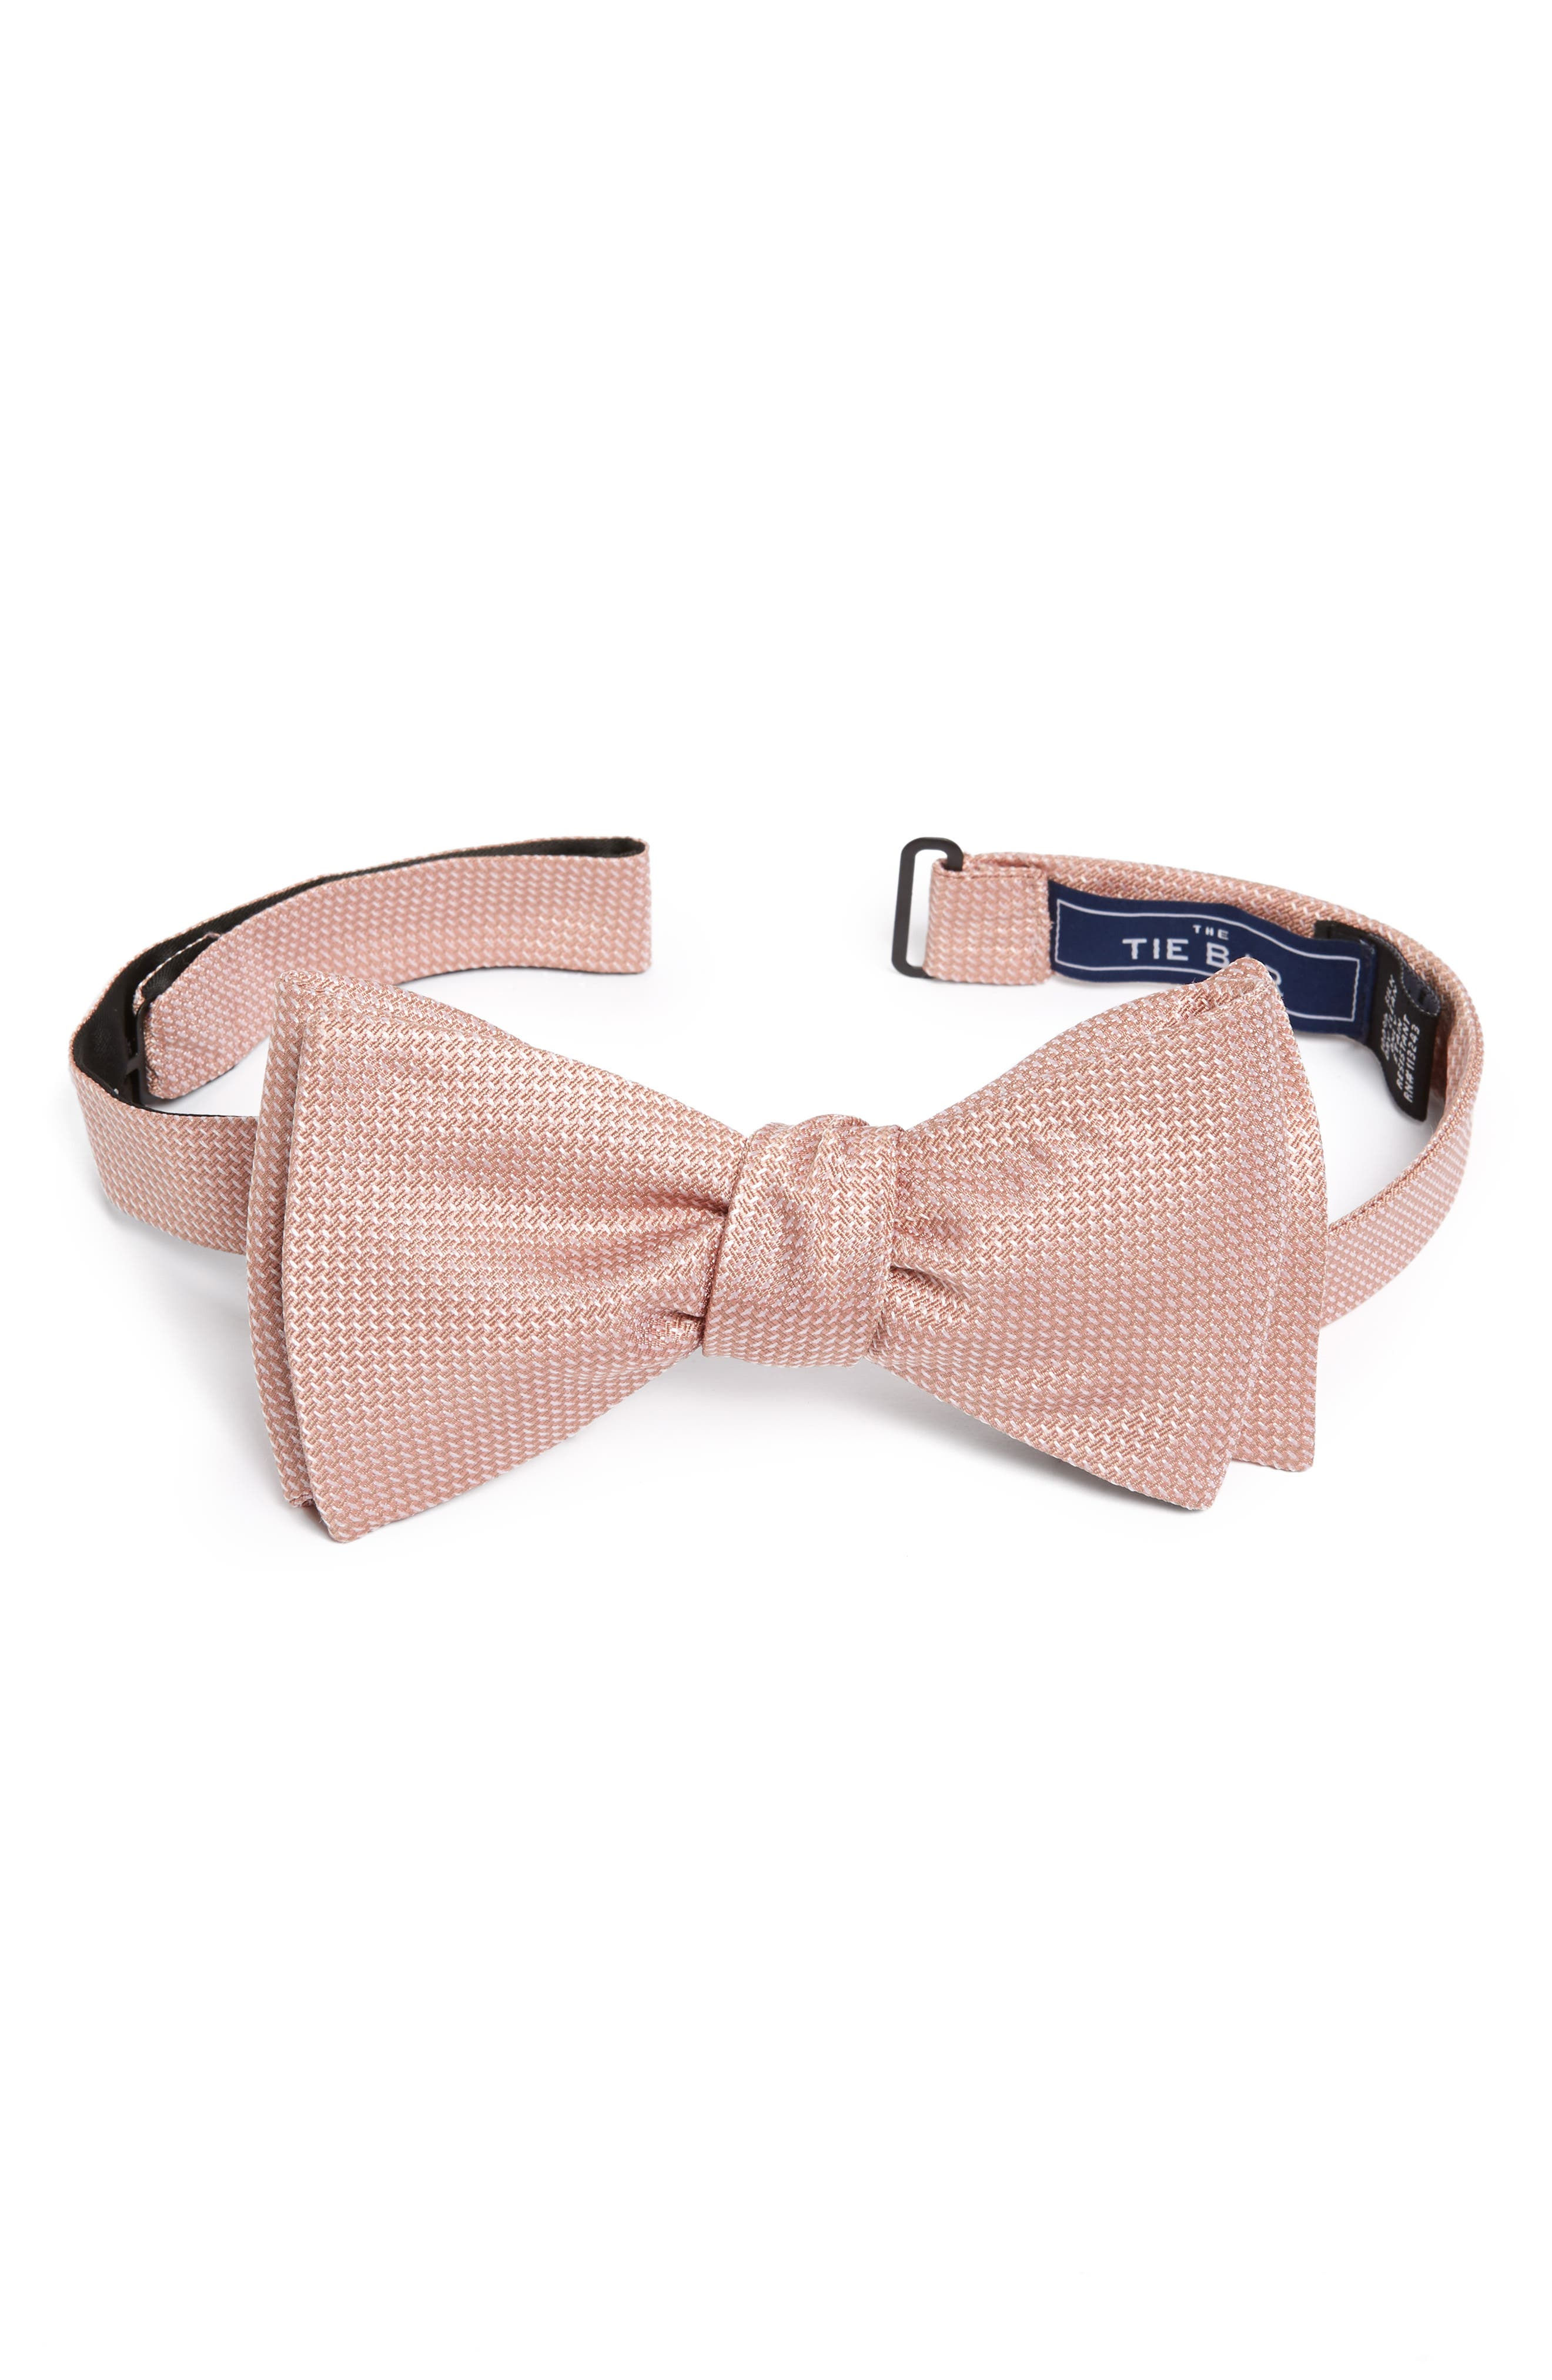 The Tie Bar Silk Bow Tie